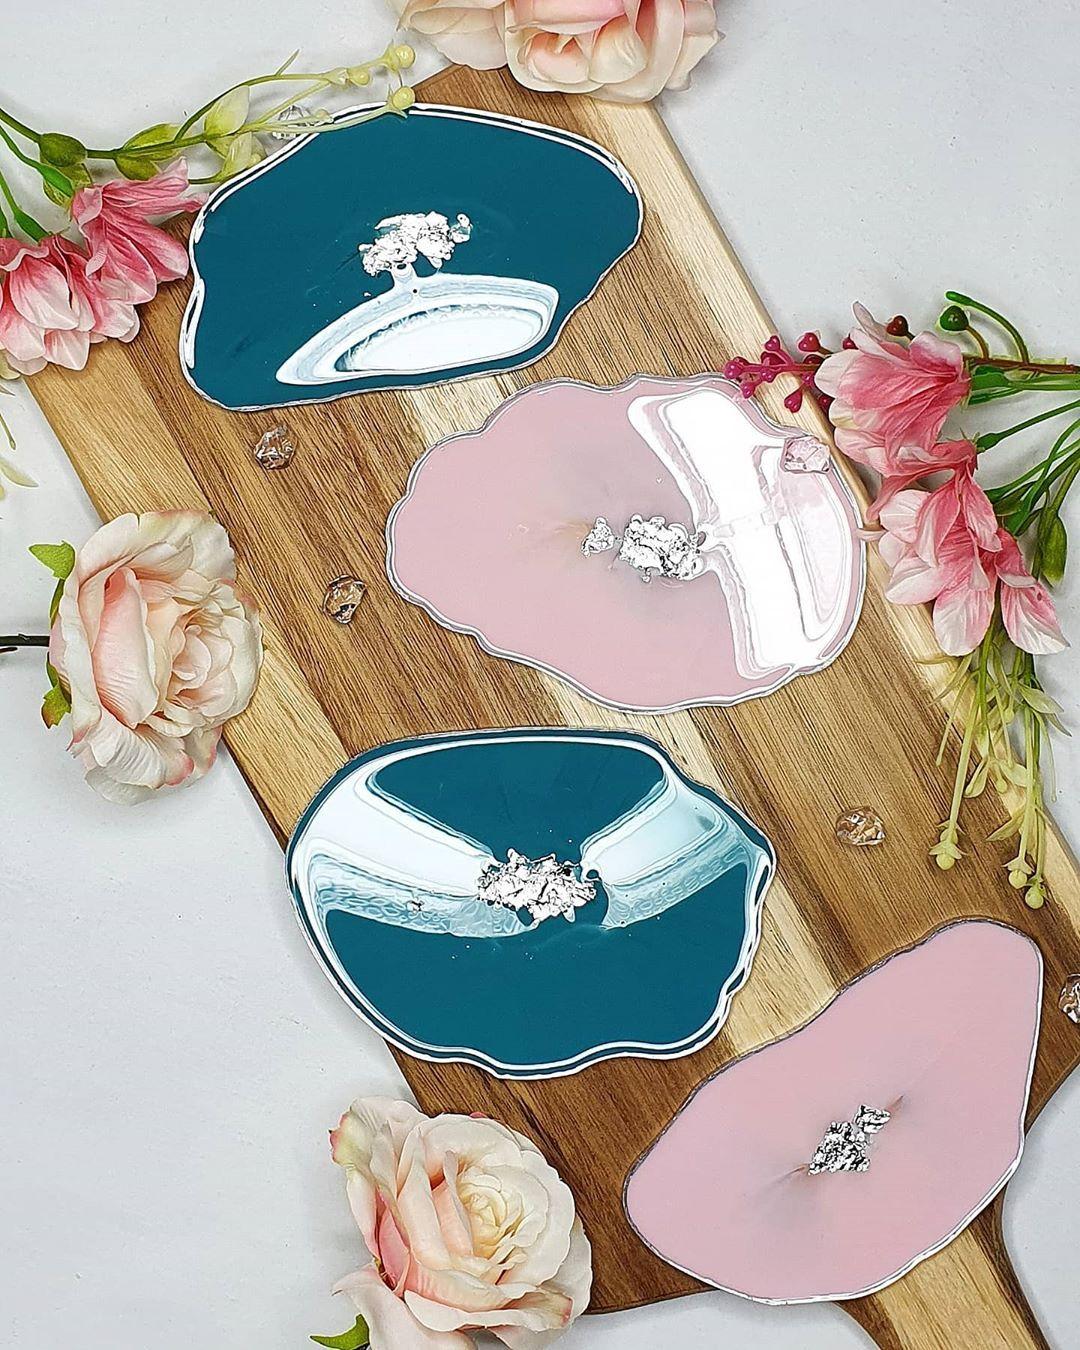 . Baby pink & torquoise for @nicola_life 💗💙 . . . #beautiful #instaart #contempary #instaartwork #homeinteriordesign #homeaccessories #homestyle #sideboard #homedecor #homeinterior #art #artwork #artist #diy #interiordesign #newartwork #artistlife #fineart #myart #diy #hamdmadecoasters #creative #color #resourceryartists #resin #resinart #coasters #handmade #resin8uk